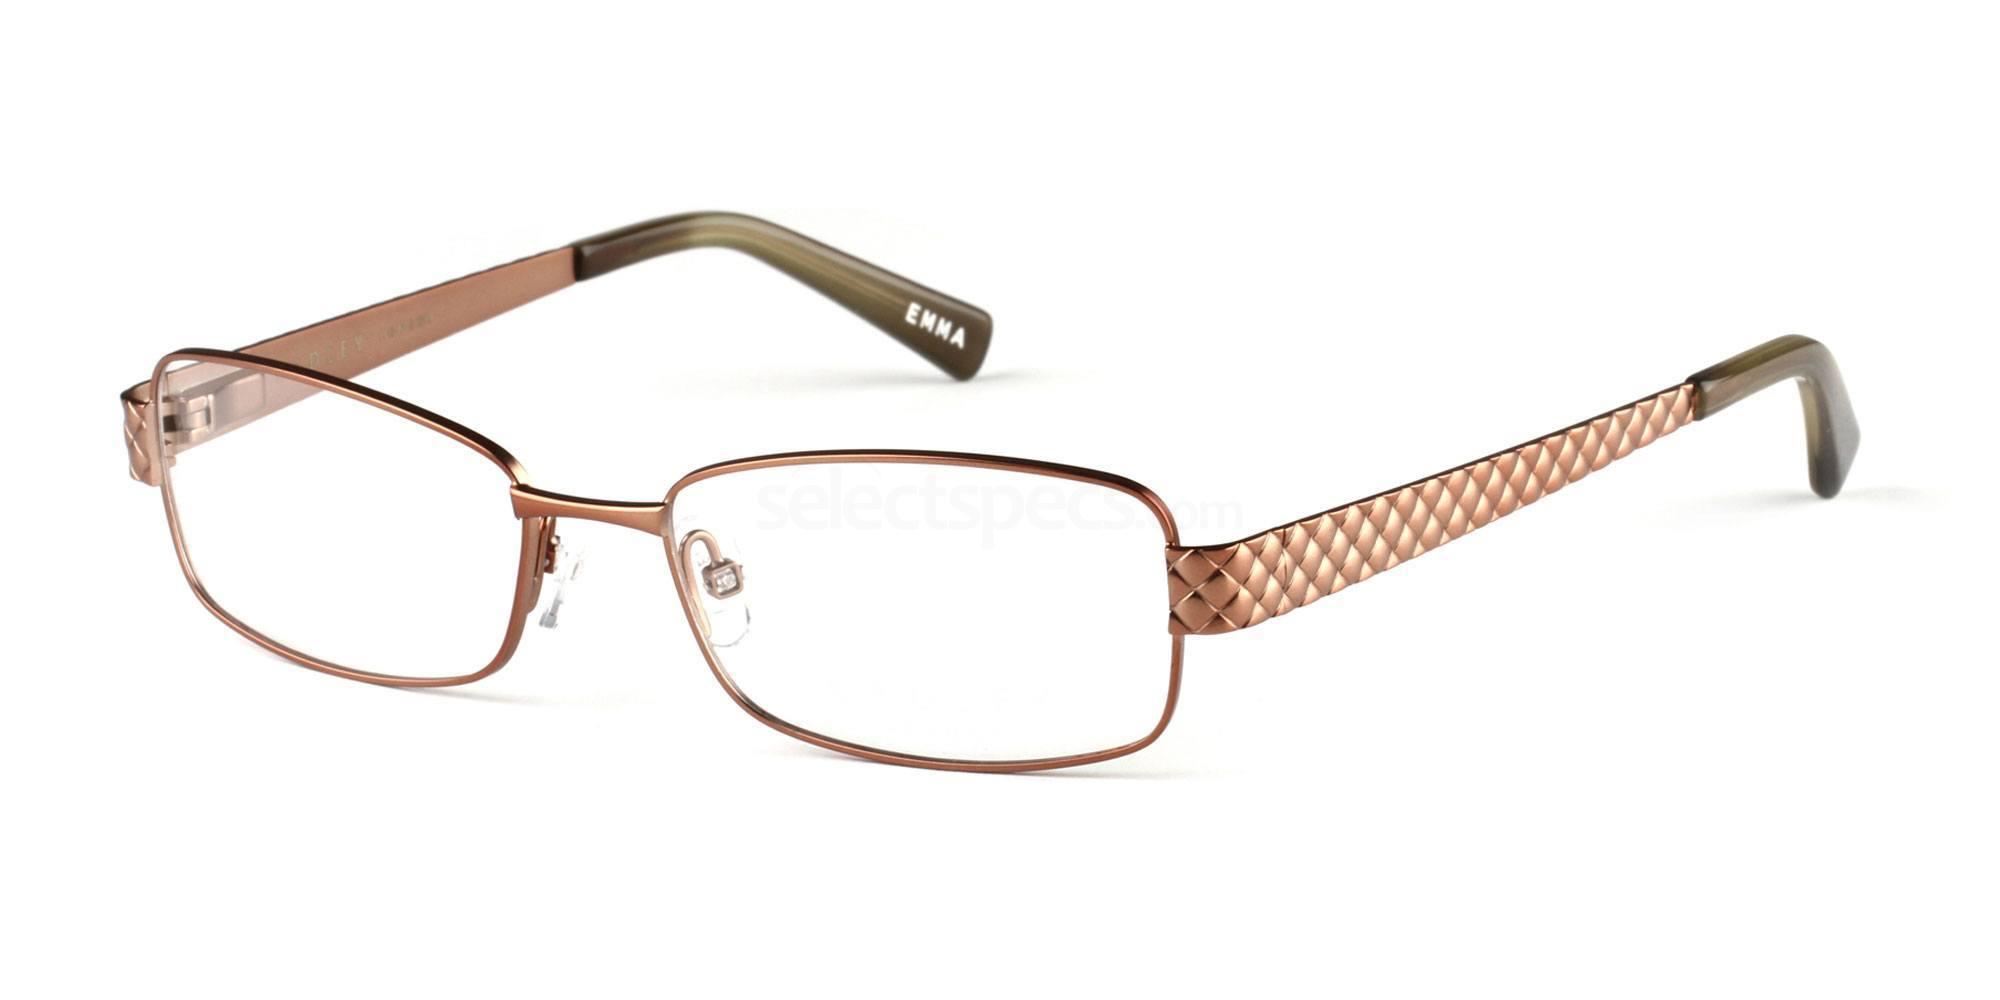 003 RDO-EMMA Glasses, Radley London